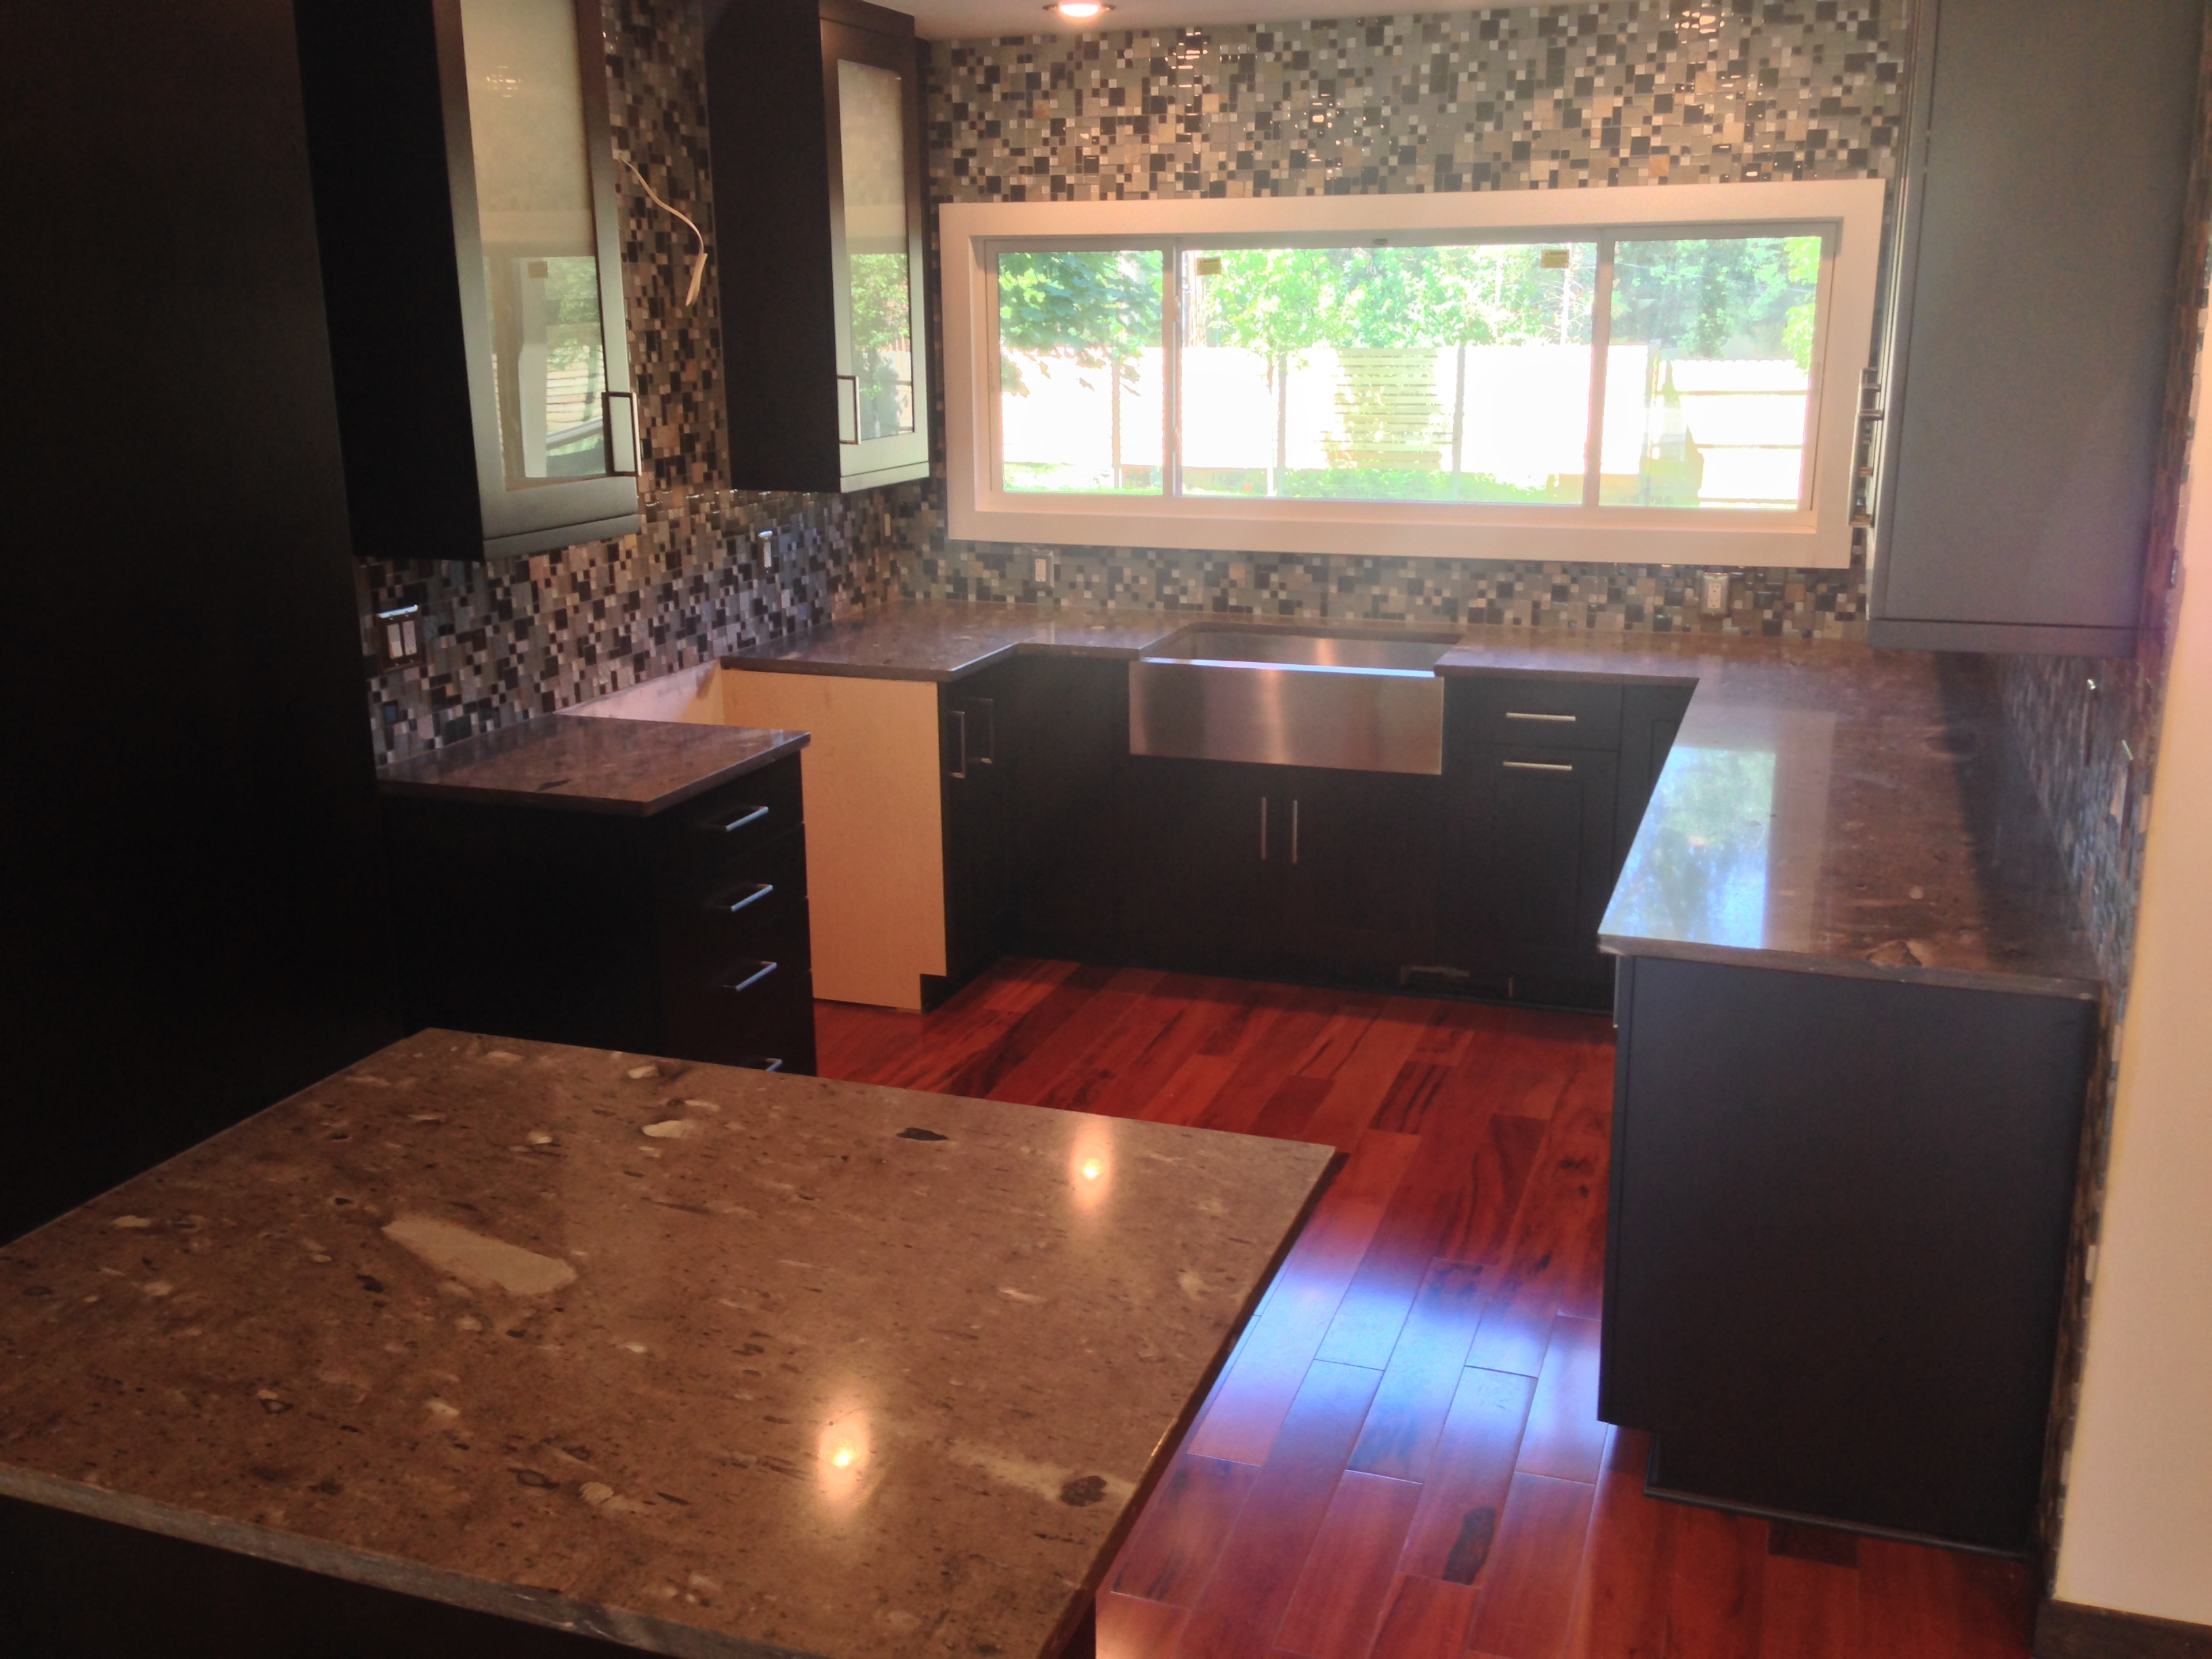 Cygnus Exotic Kitchen Granite Countertops With Straight Edge In Detroit, MI.